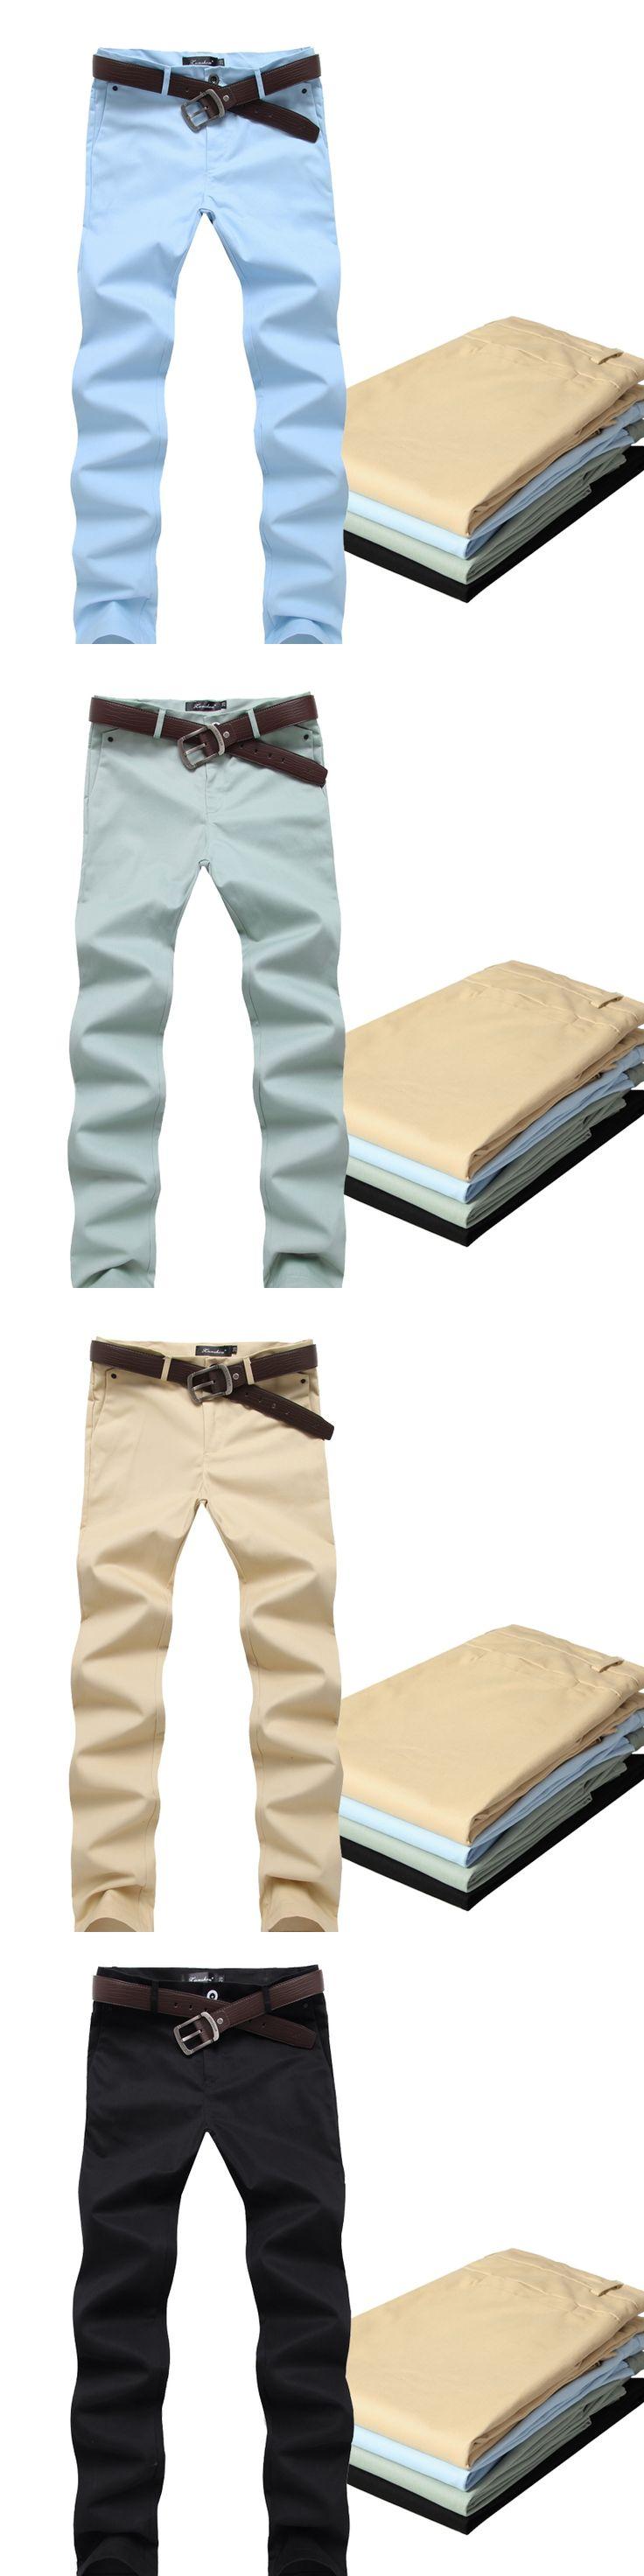 New 2016 male work dress casual pants slim fit straight trousers men men's clothing pantalones hombre size 28-36 5-colors /XXK2